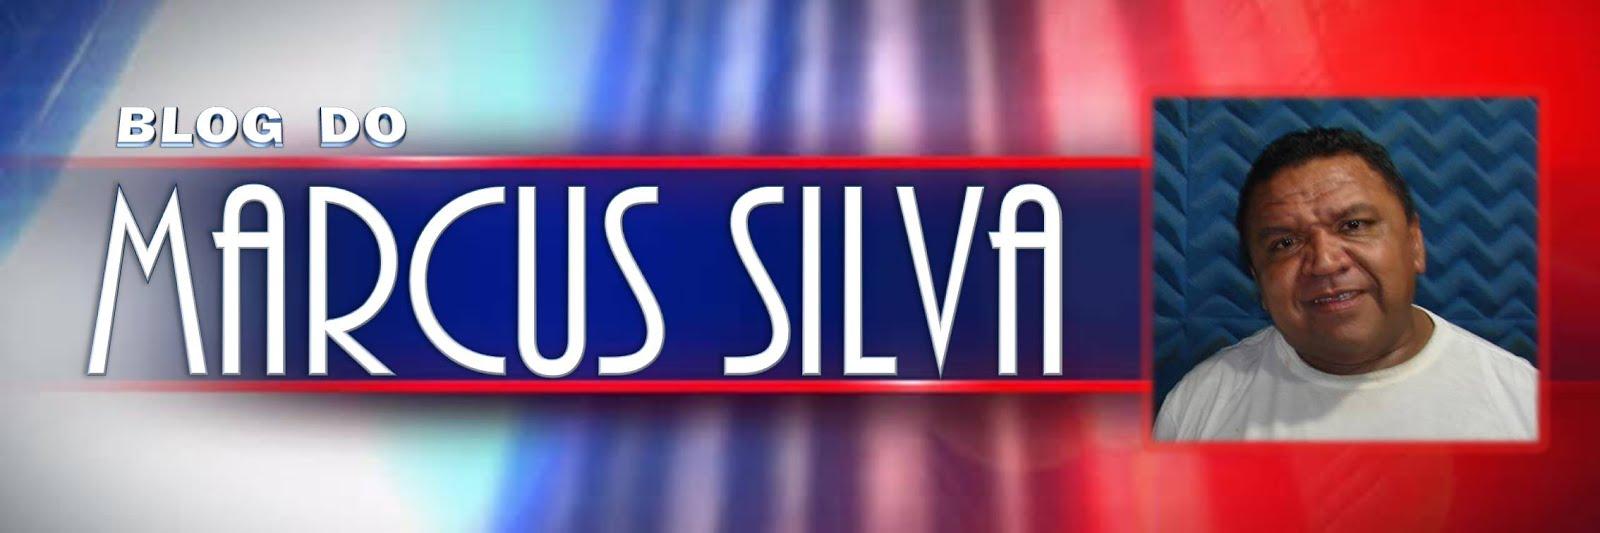 Blog do Marcus SIlva